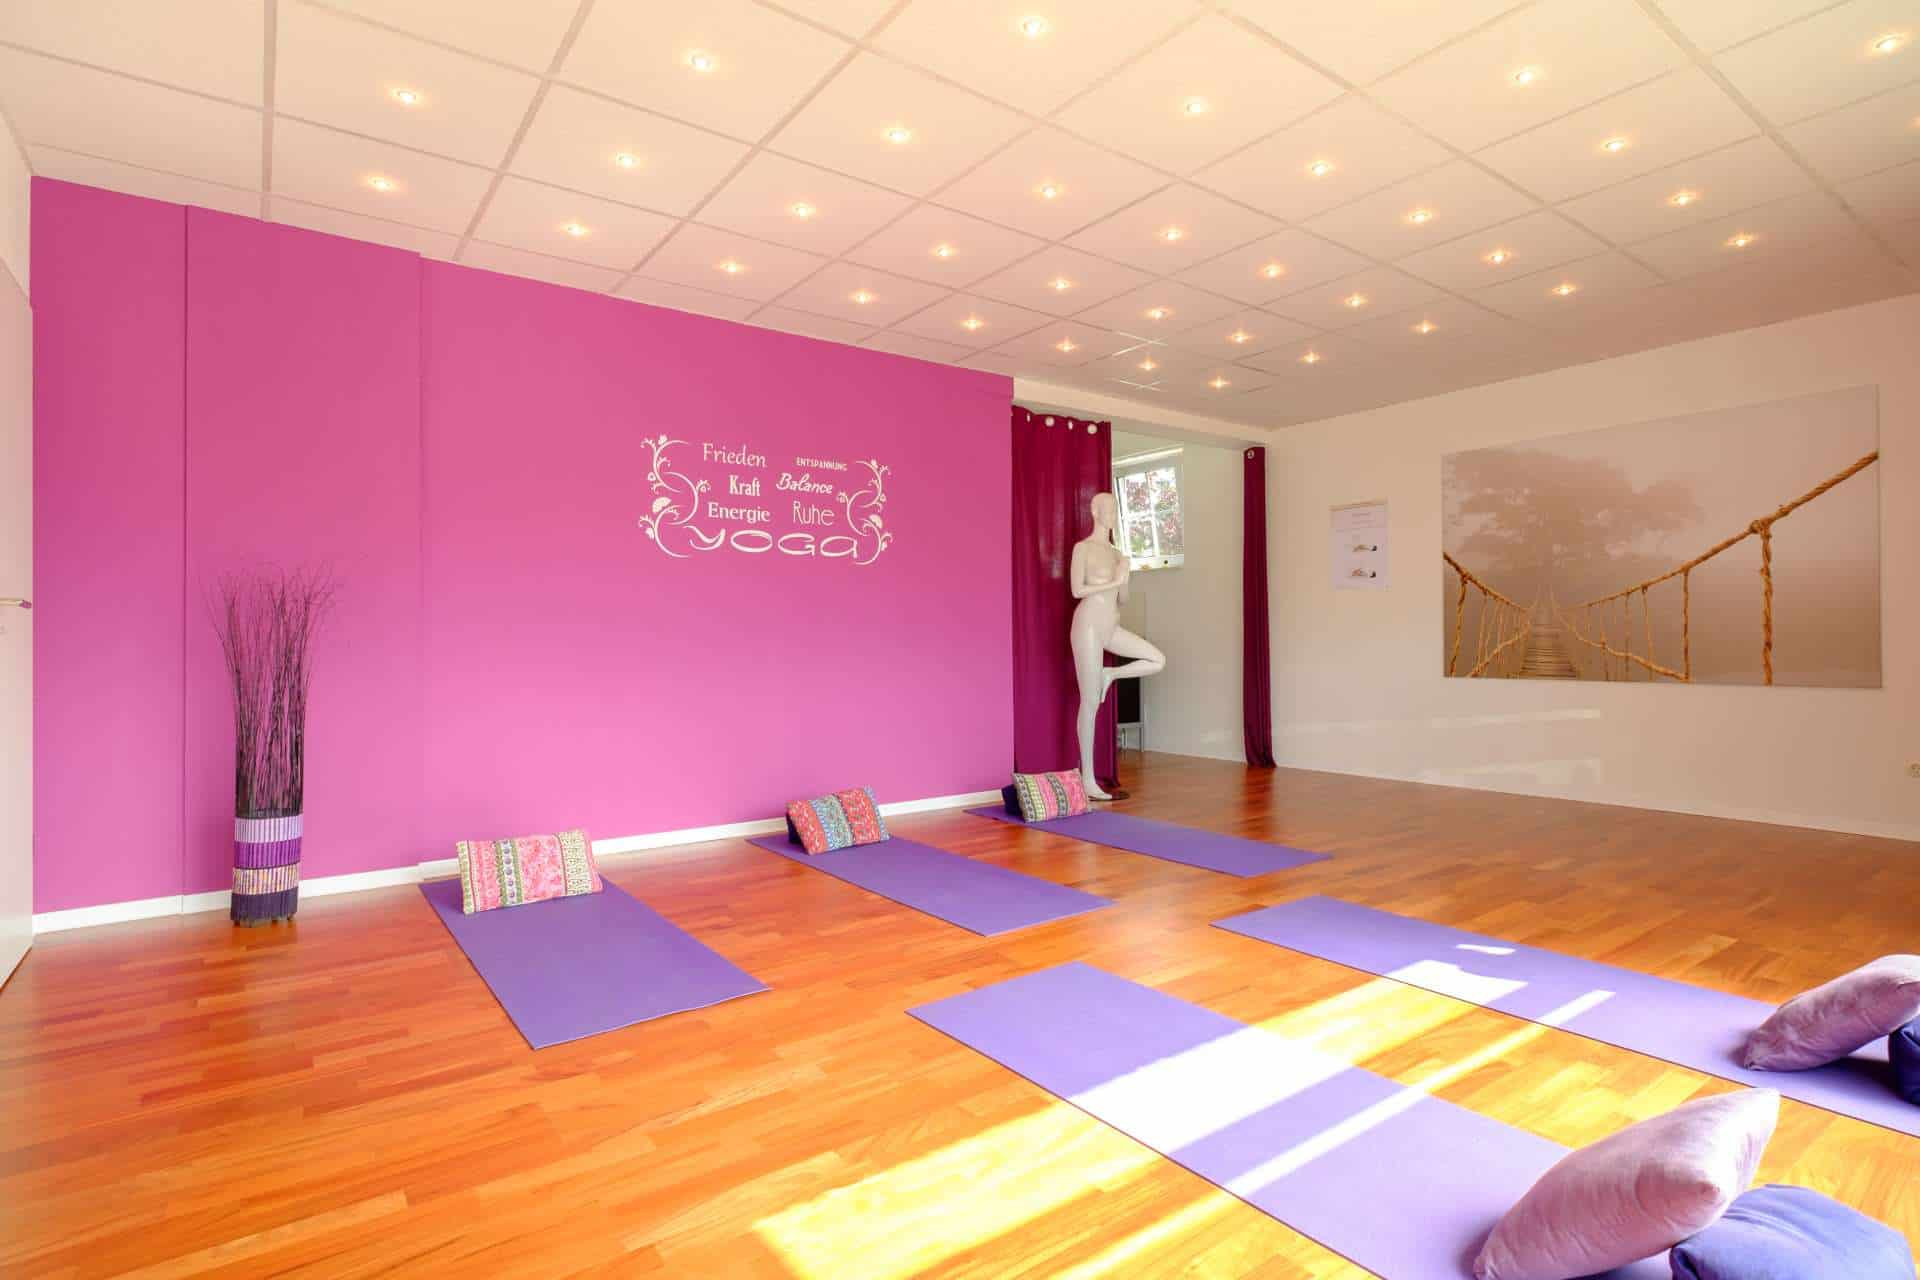 Umbau – Erweiterung in der Tripada Akademie in Bocholt